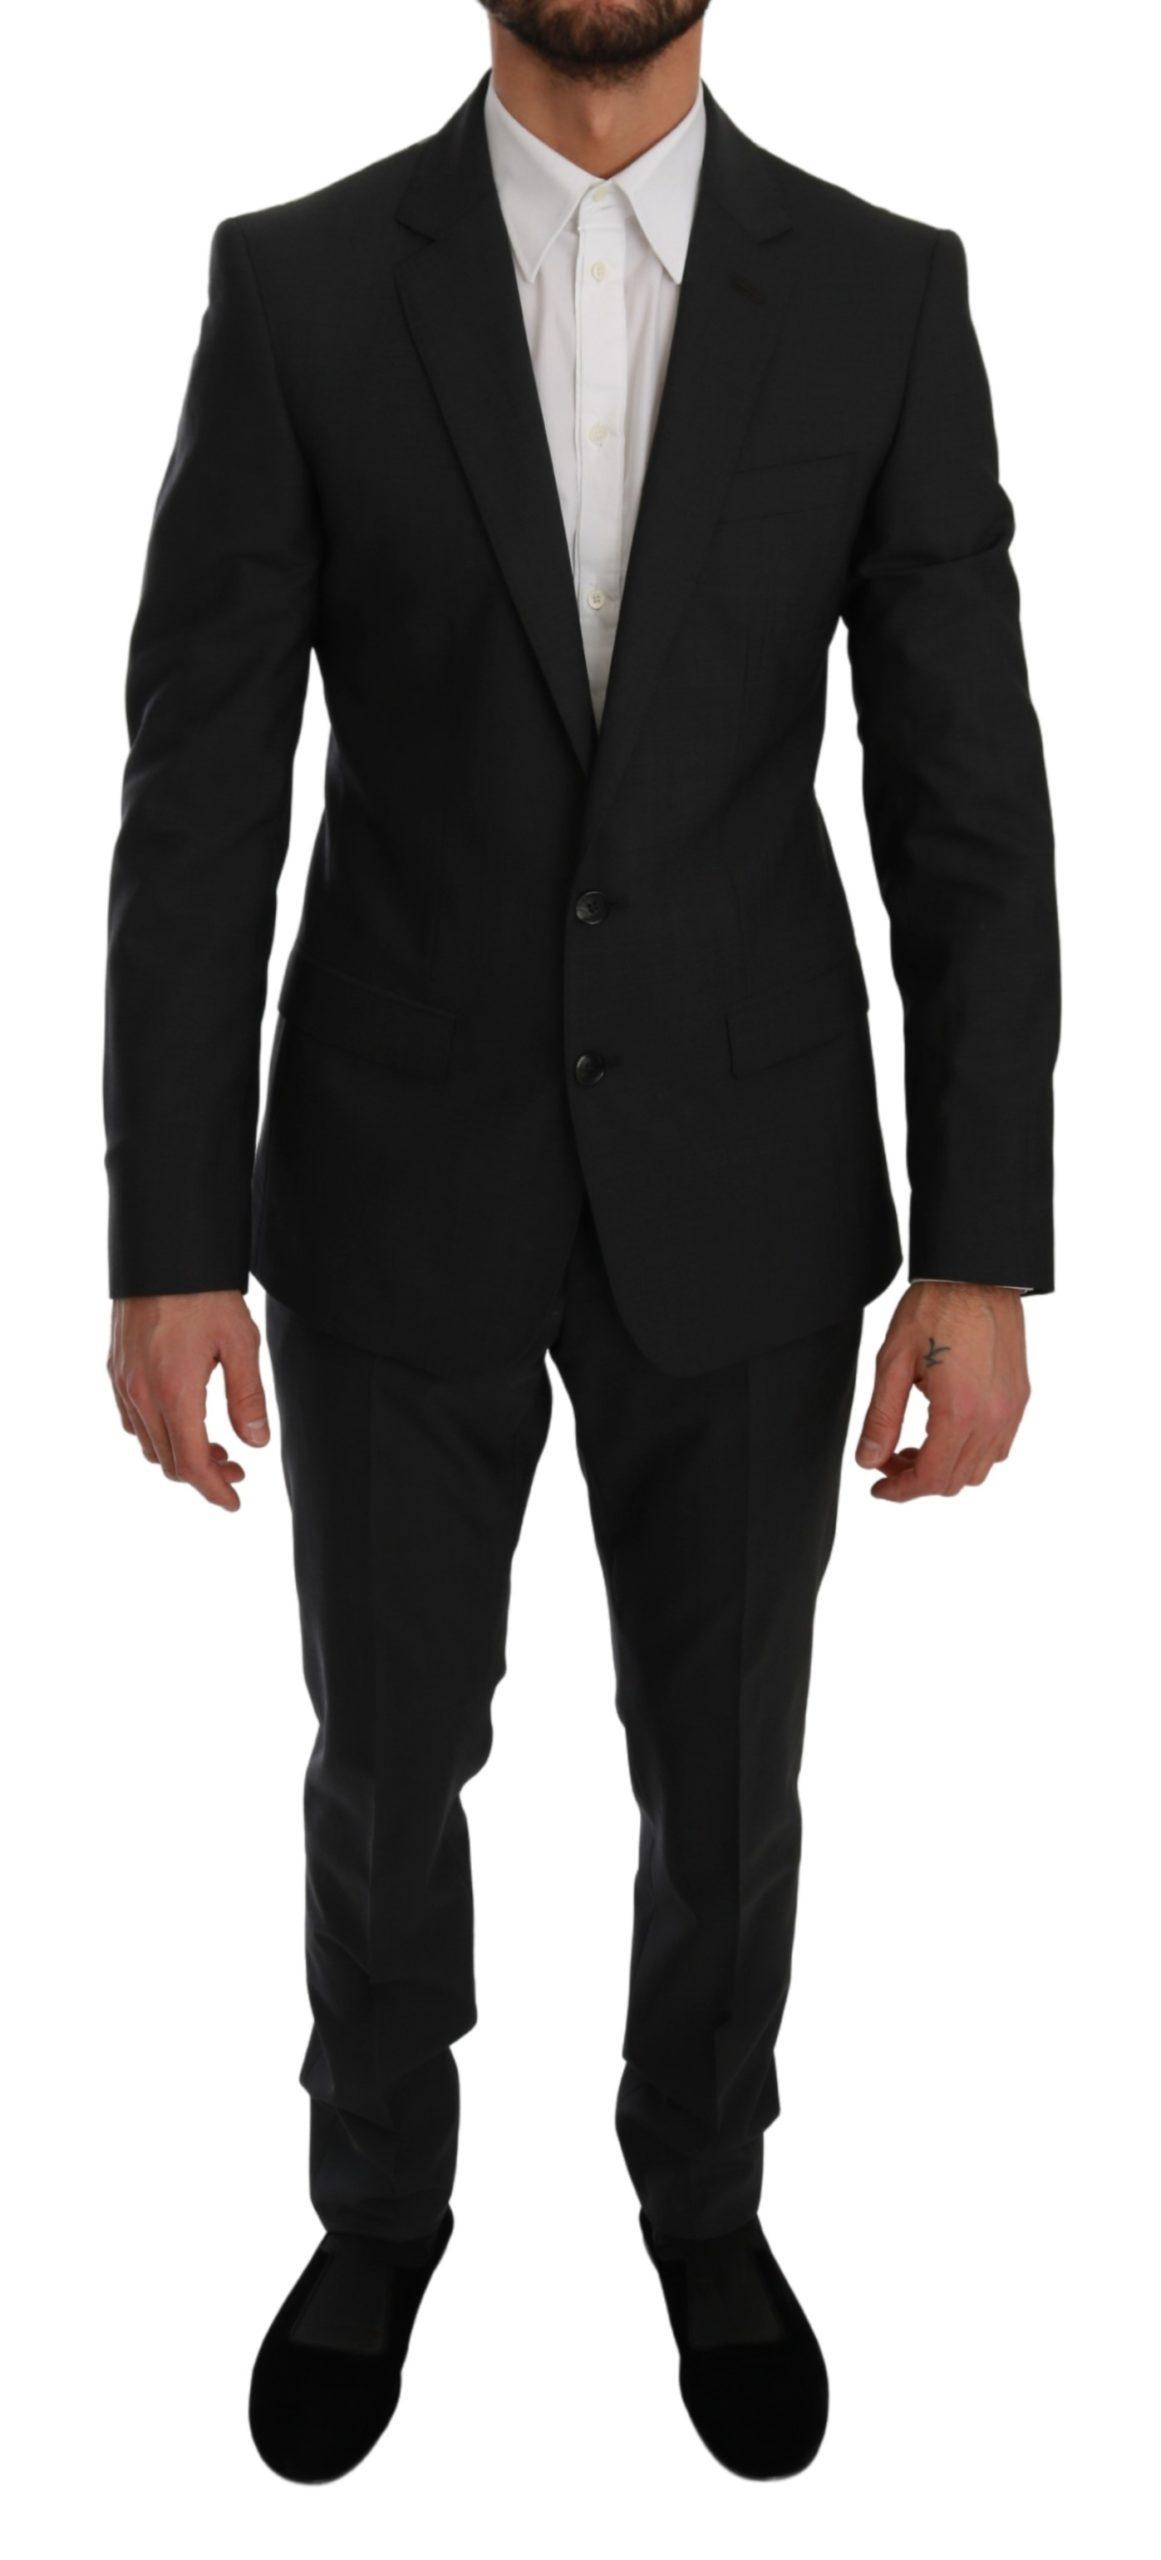 Dolce & Gabbana Men's Slim Fit 2 Piece MARTINI Suit Gray KOS1756 - IT46   S